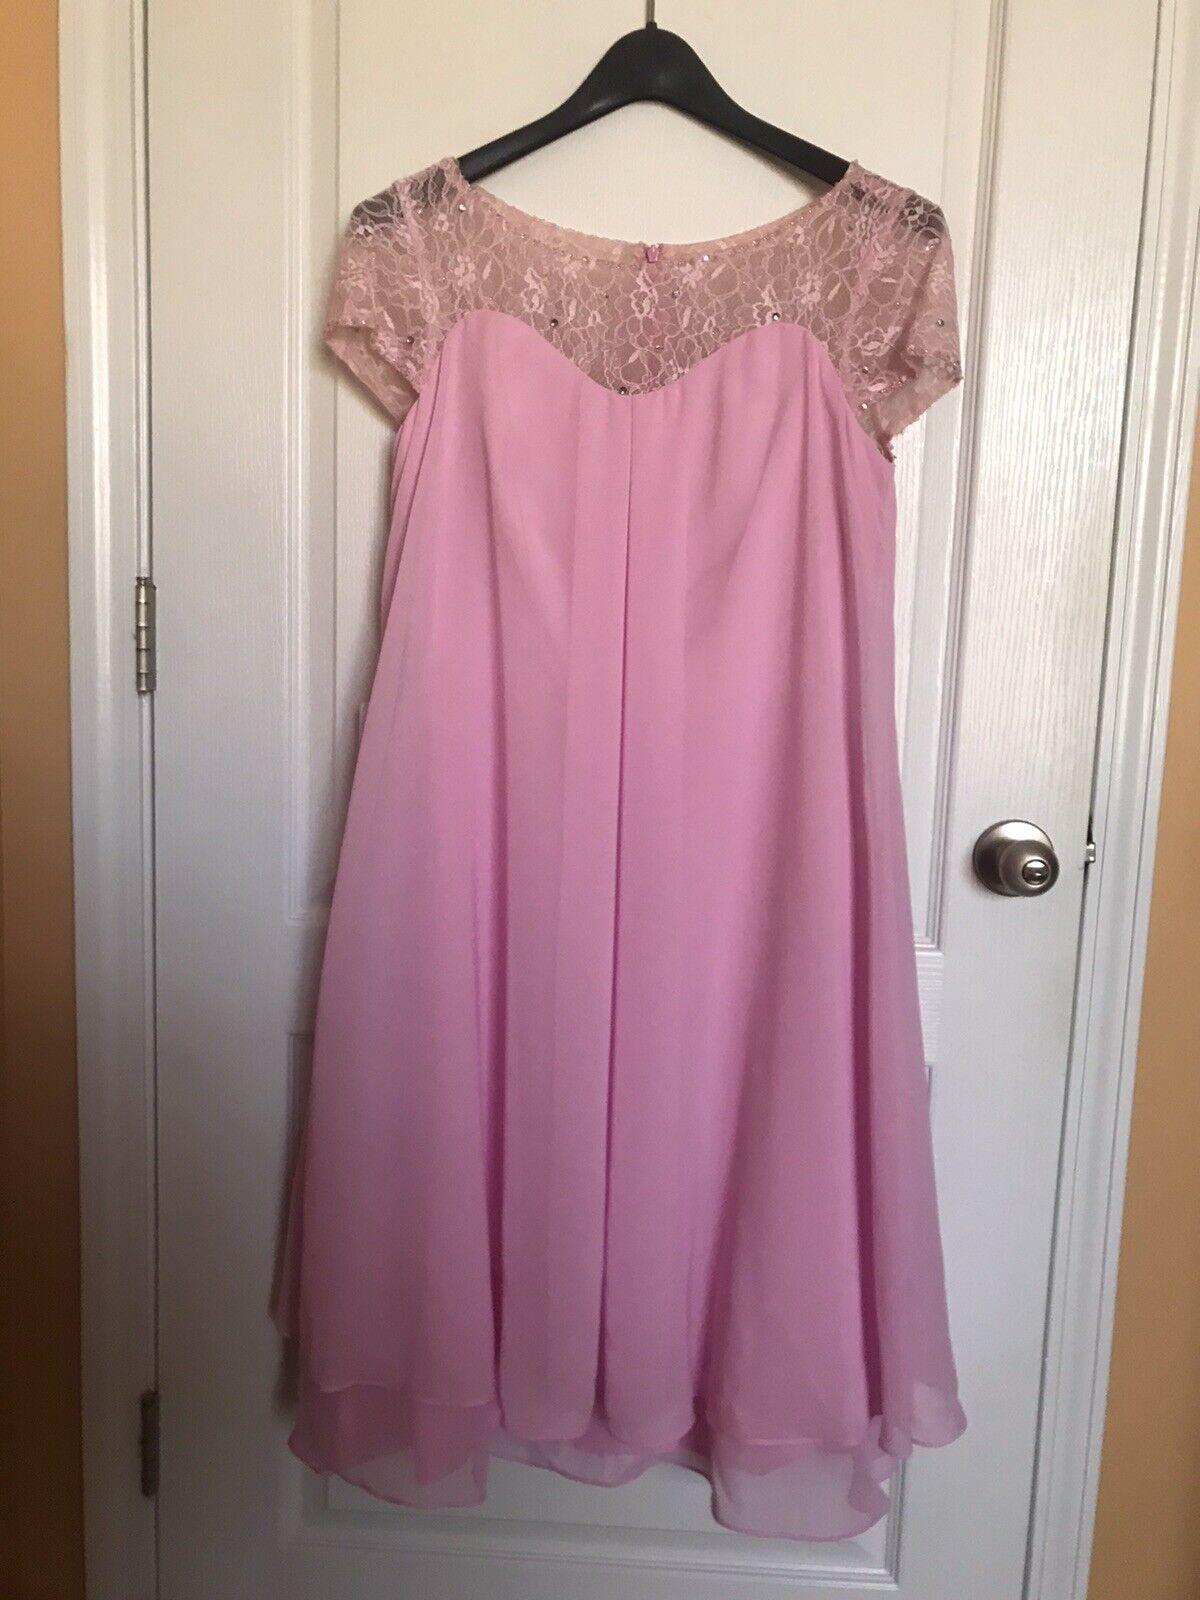 JJs House brand dress, Size 10